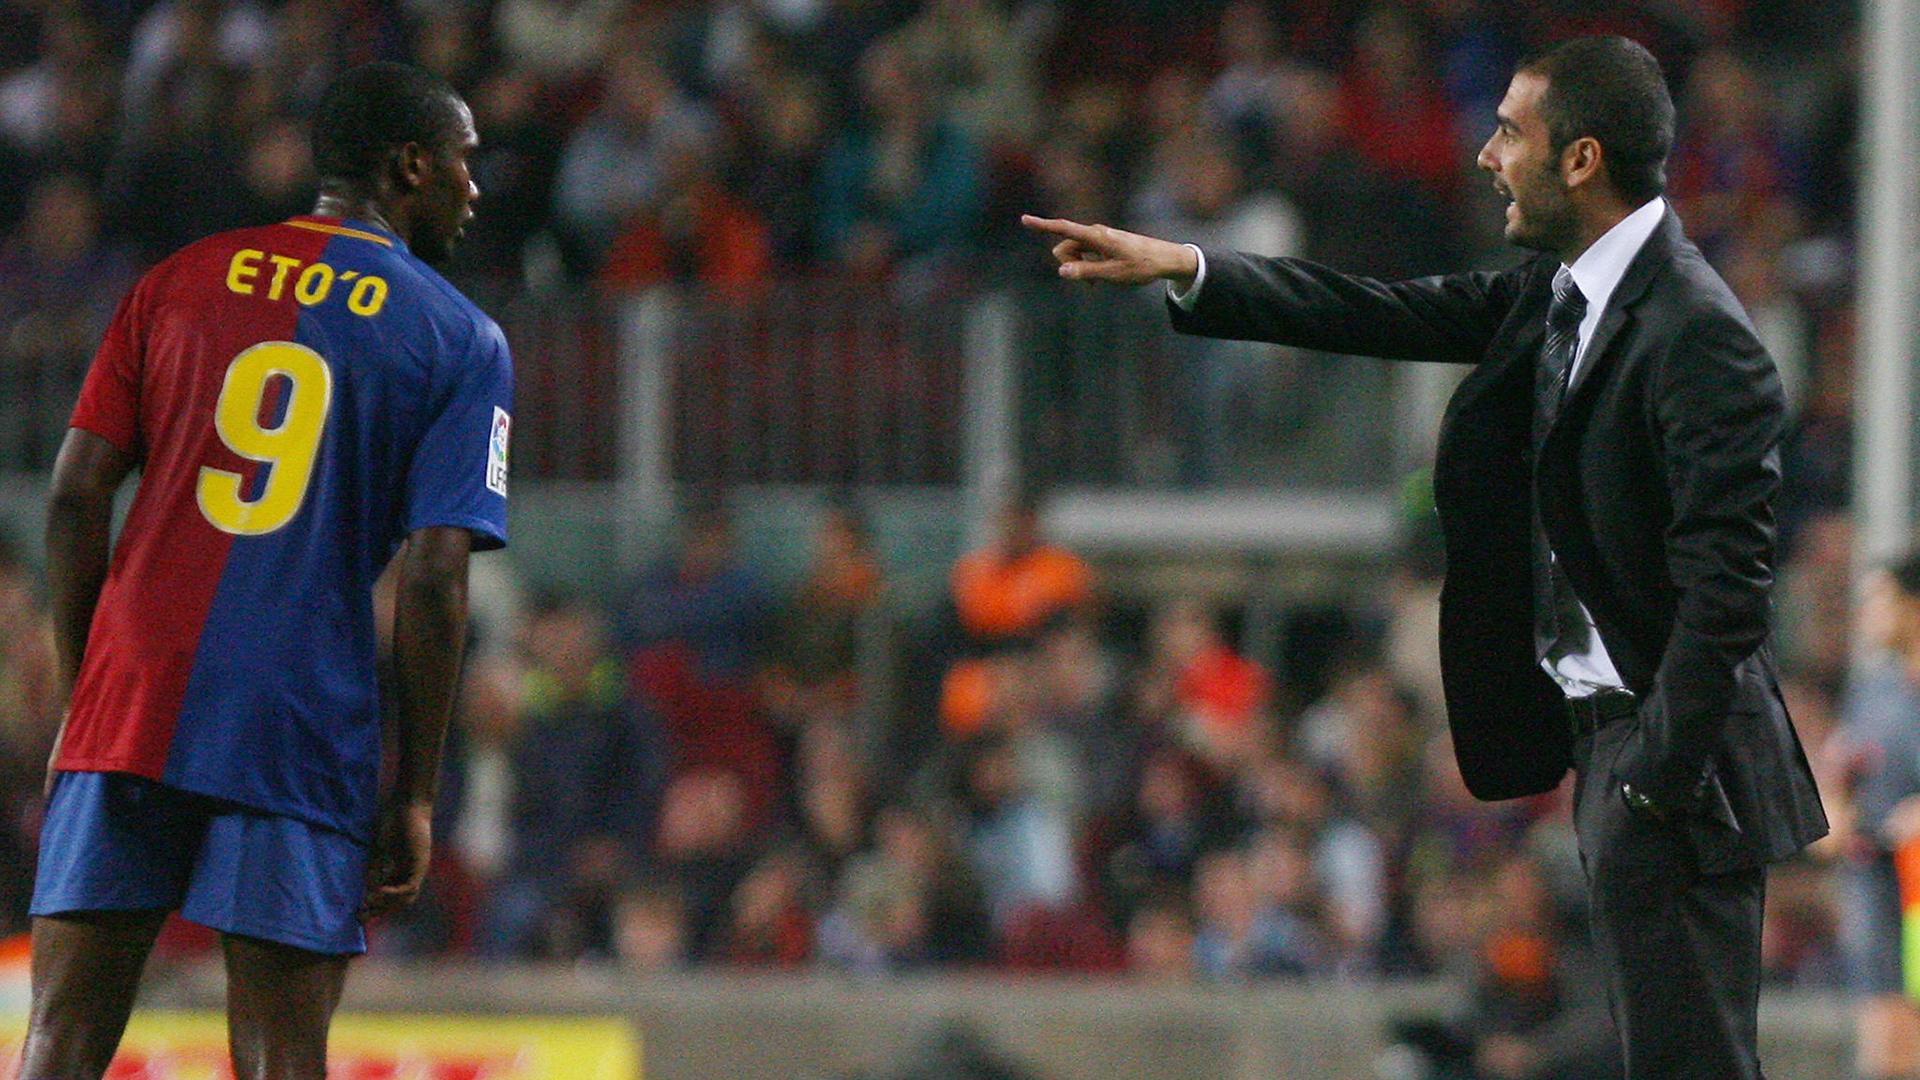 Pep Guardiola Samuel Eto'o Barcelona